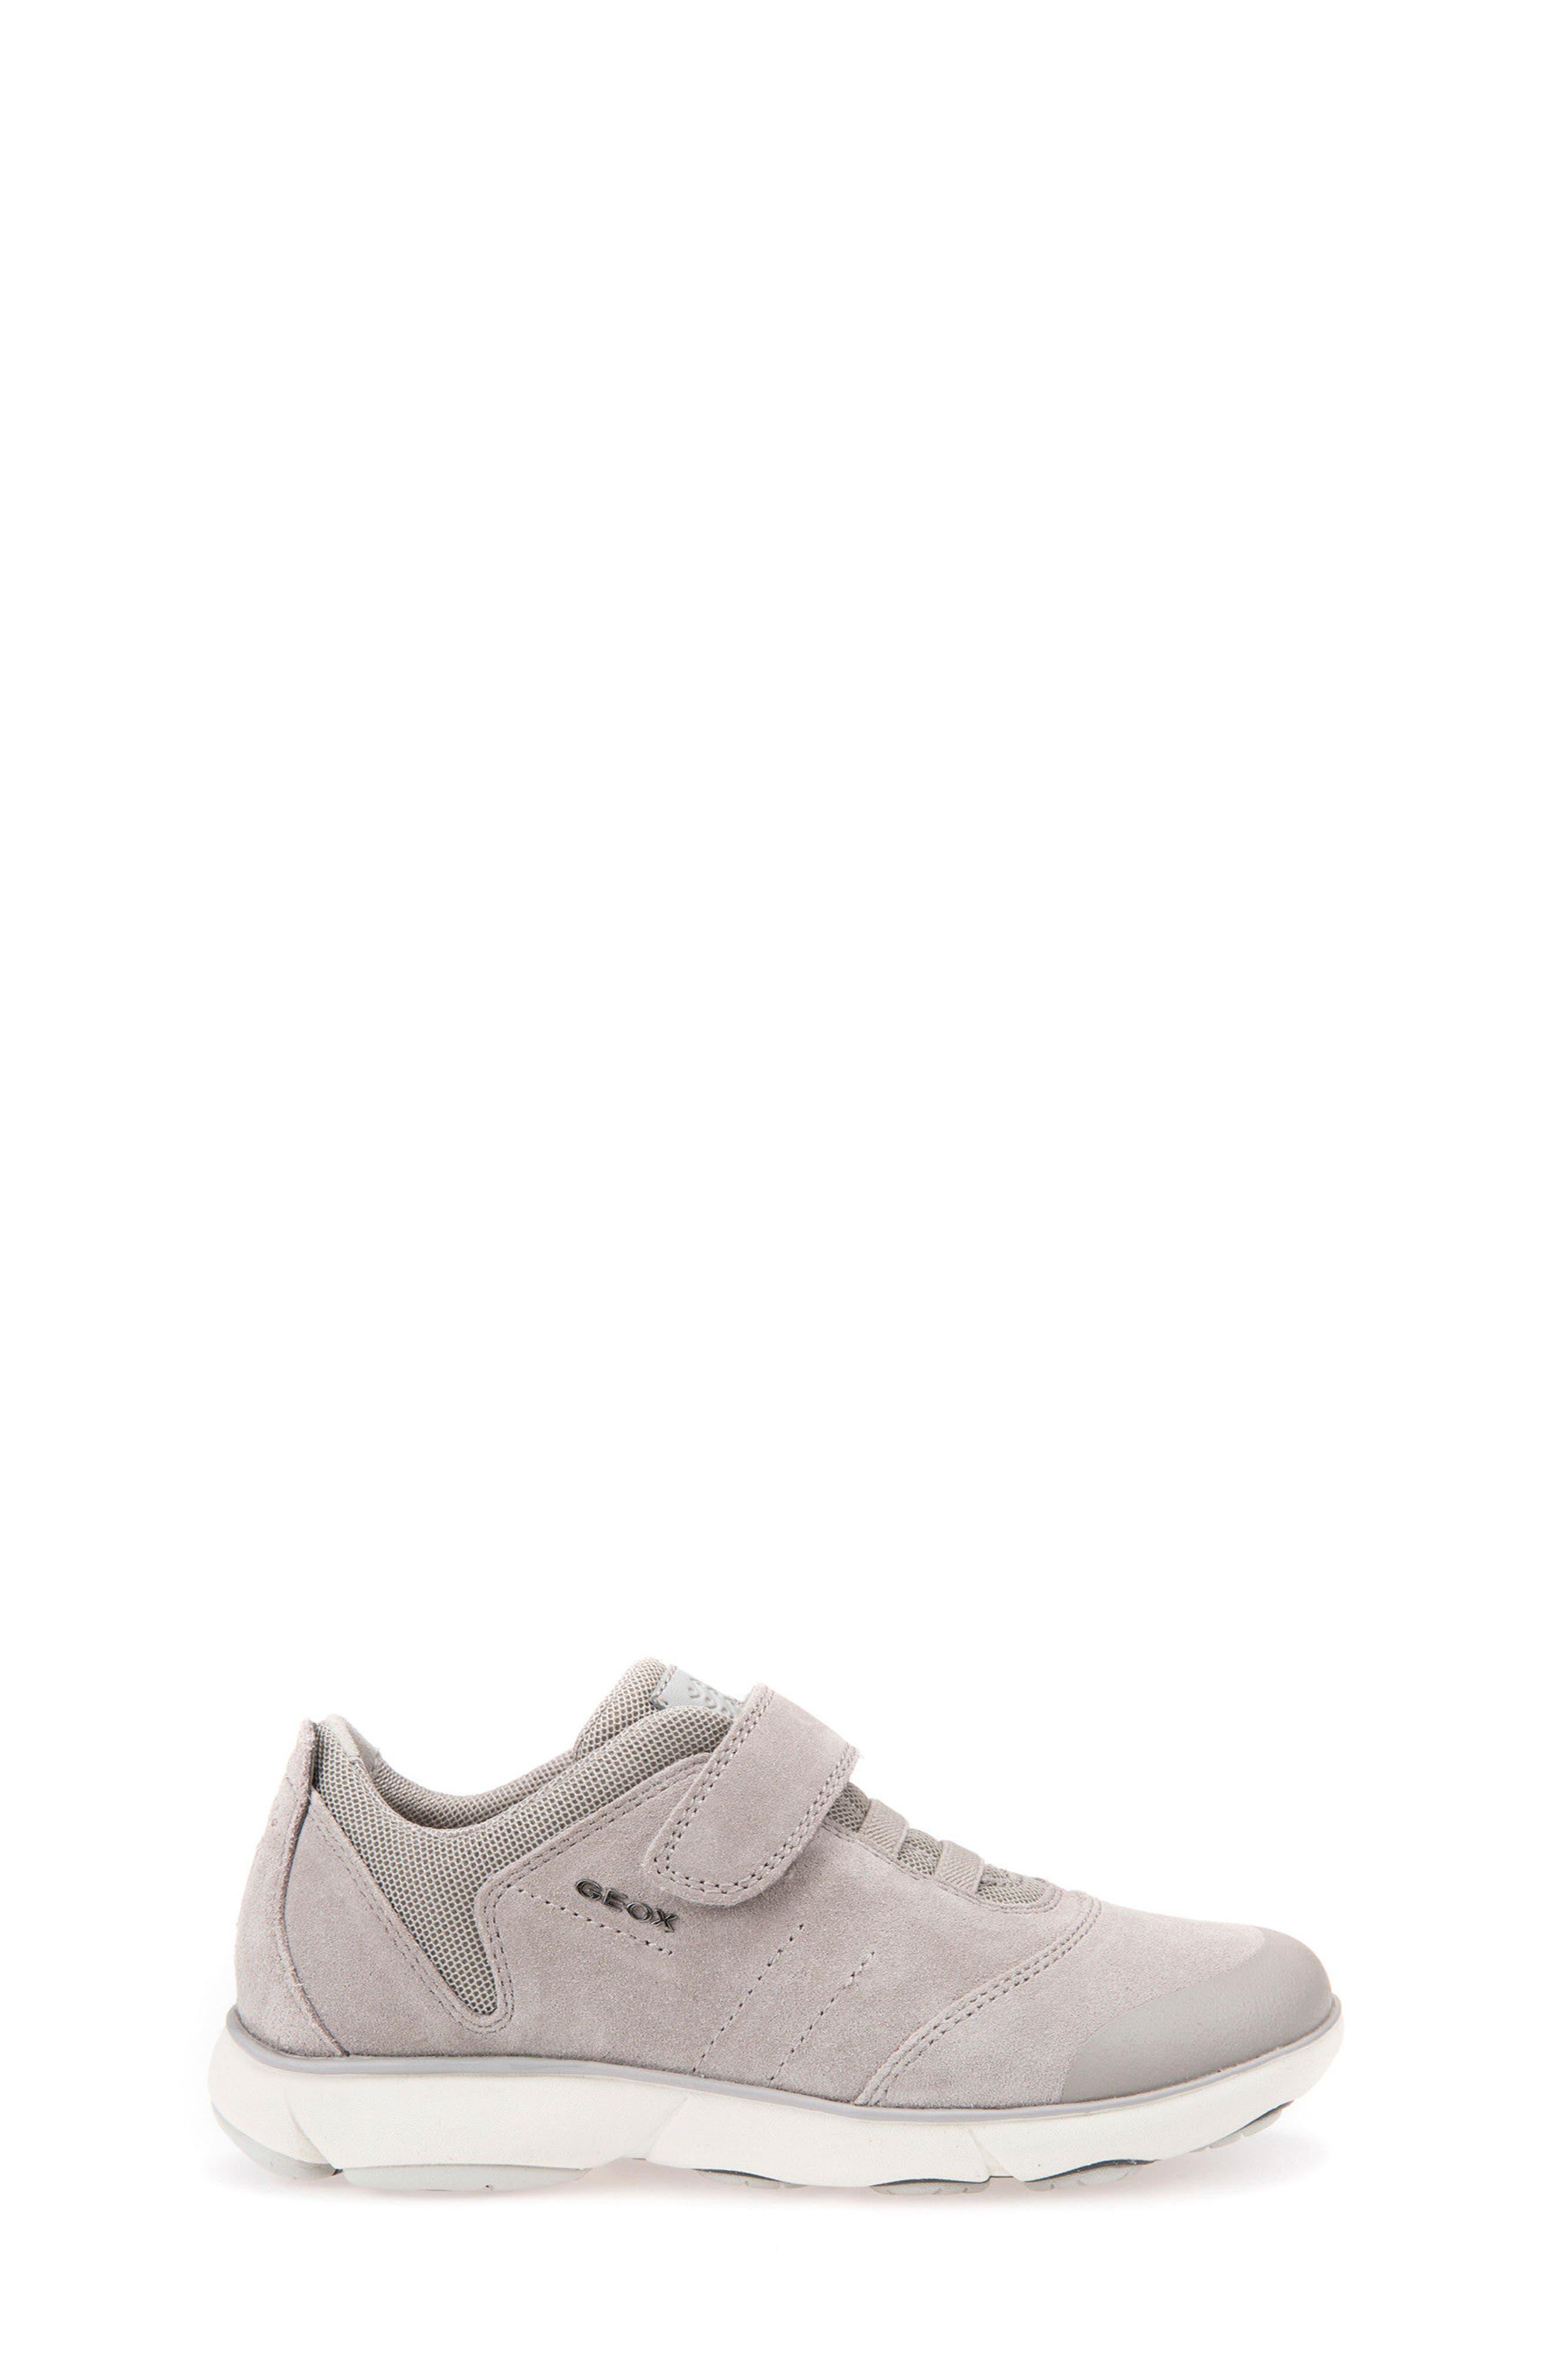 Nebula Low Top Sneaker,                             Alternate thumbnail 3, color,                             Grey